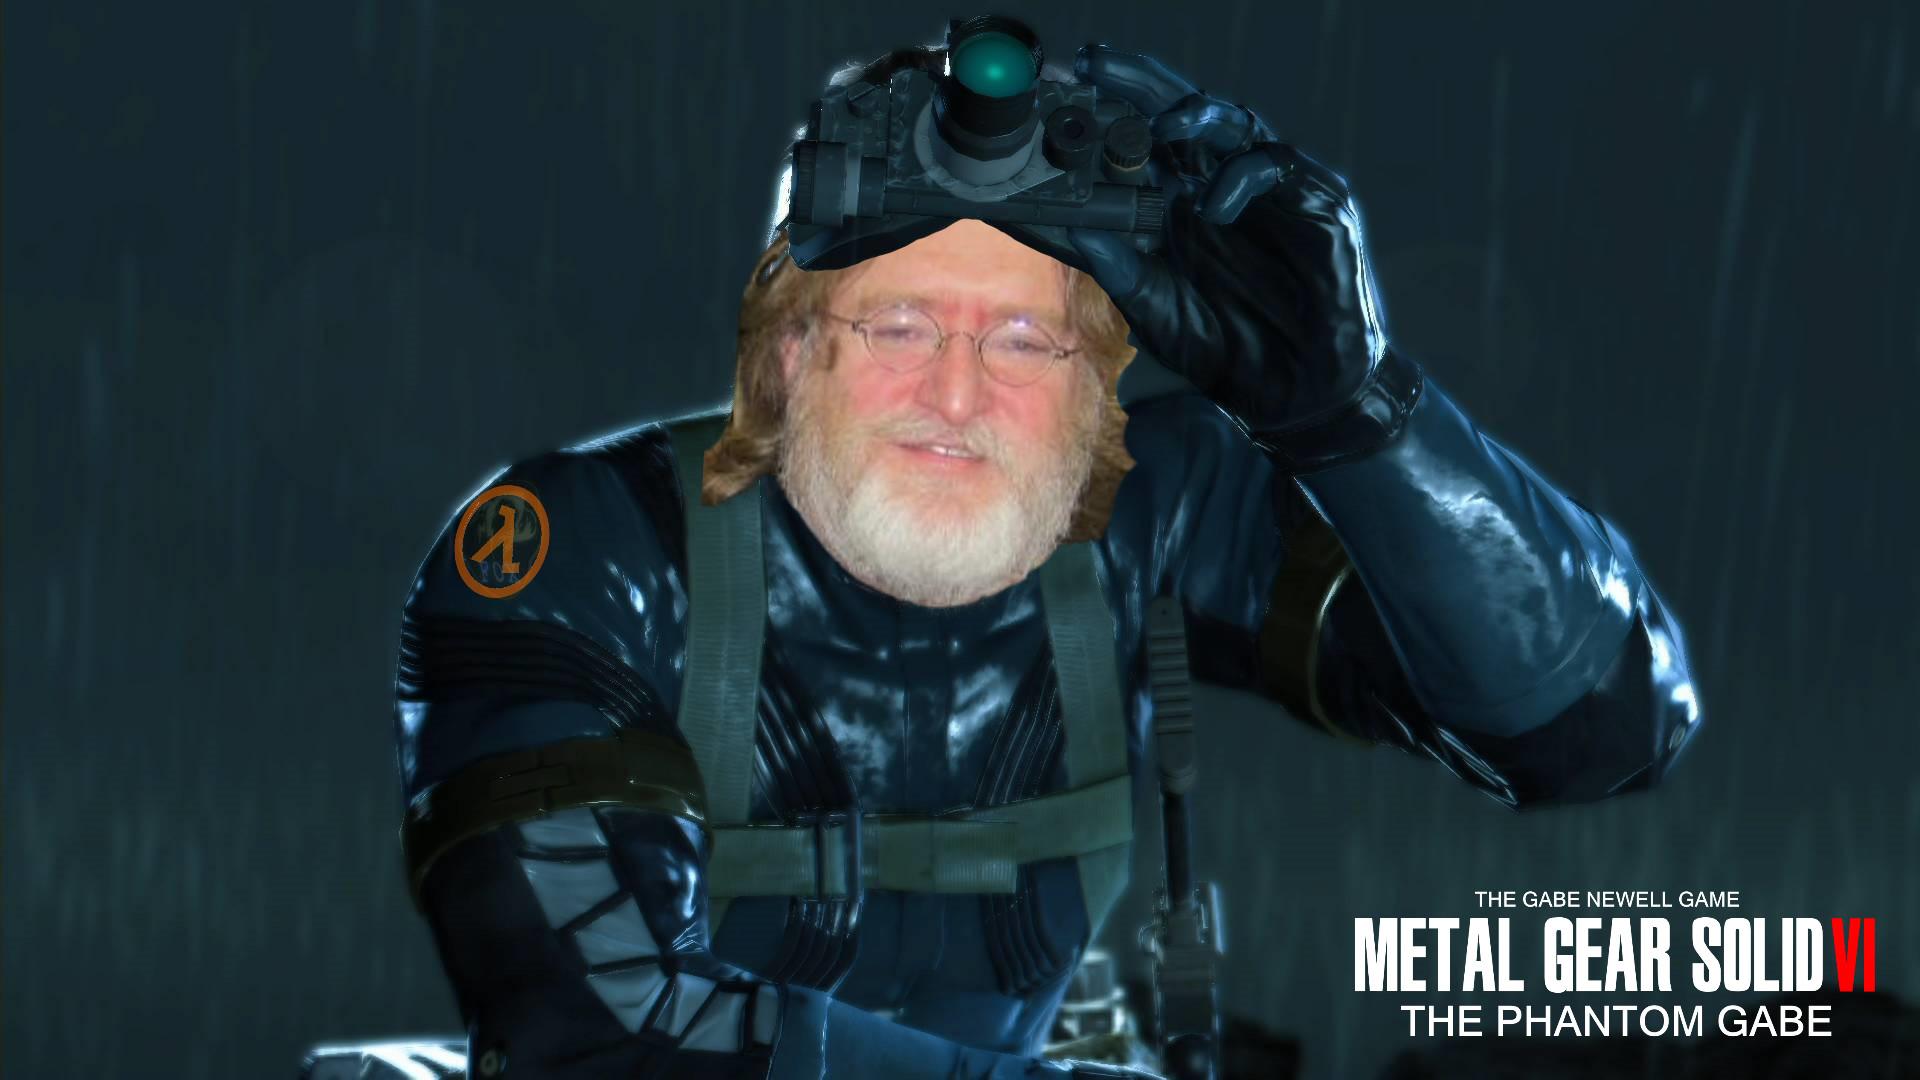 … Metal Gear Solid 6 The Phantom Gabe Art 2 by Fpew